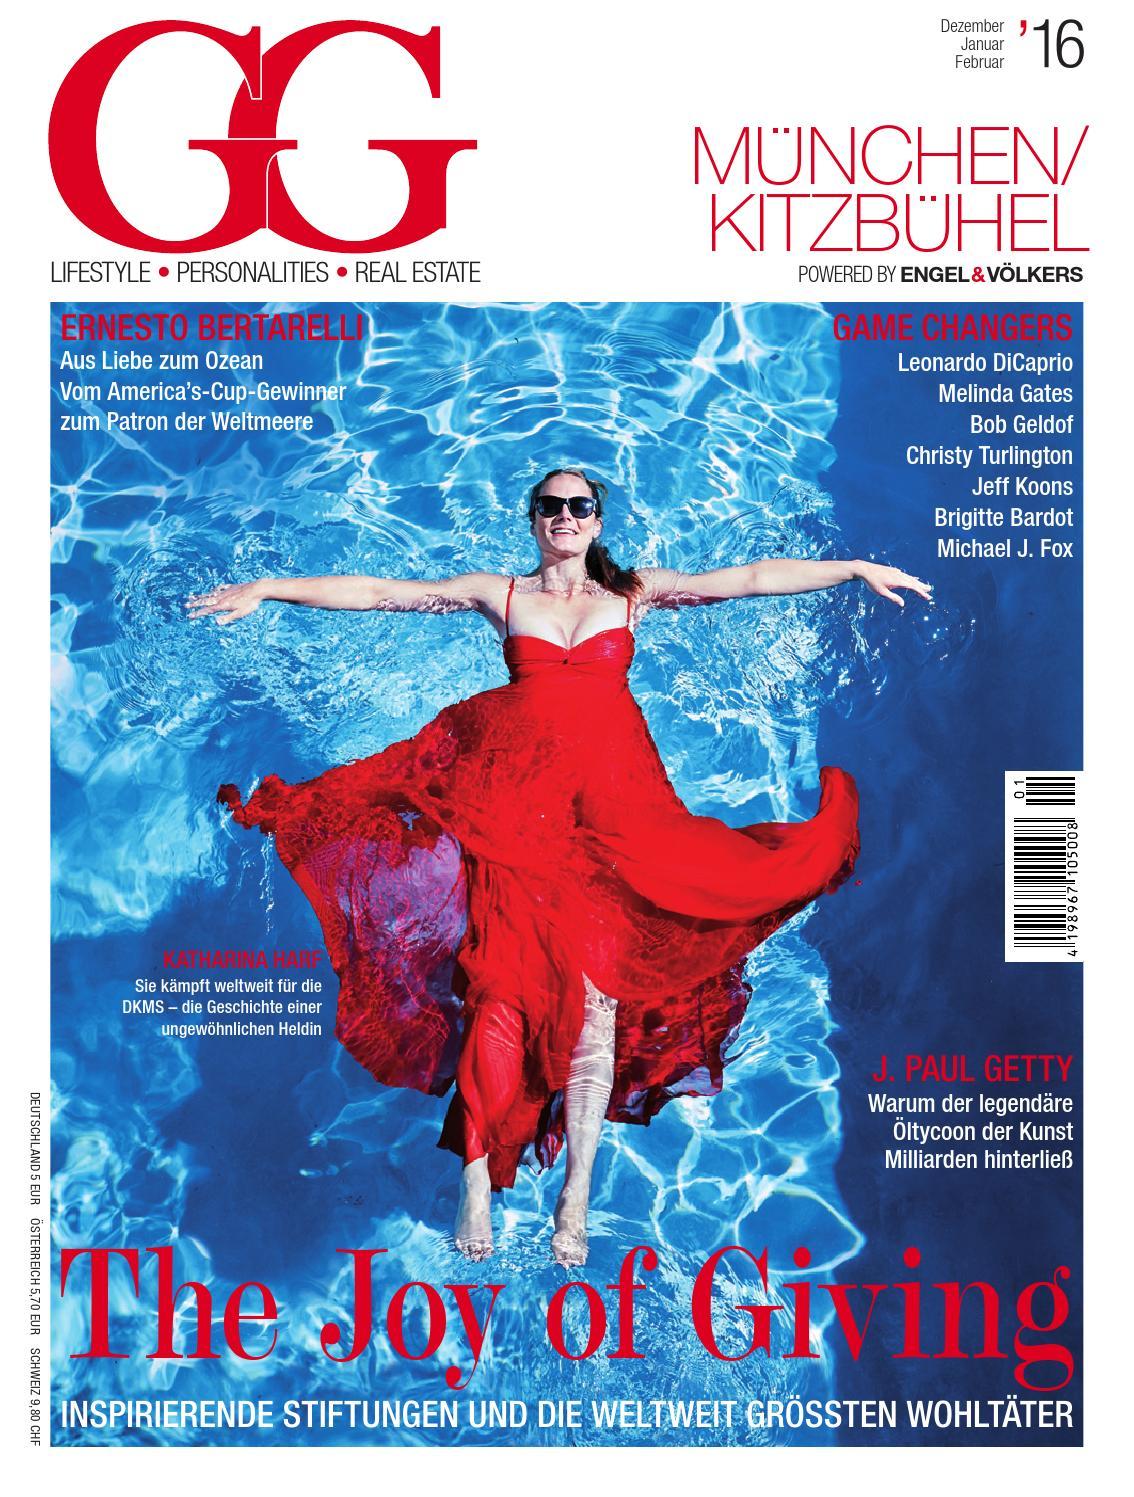 Gg Magazine 012016 Münchenkitzbühel By Gg Magazine Issuu